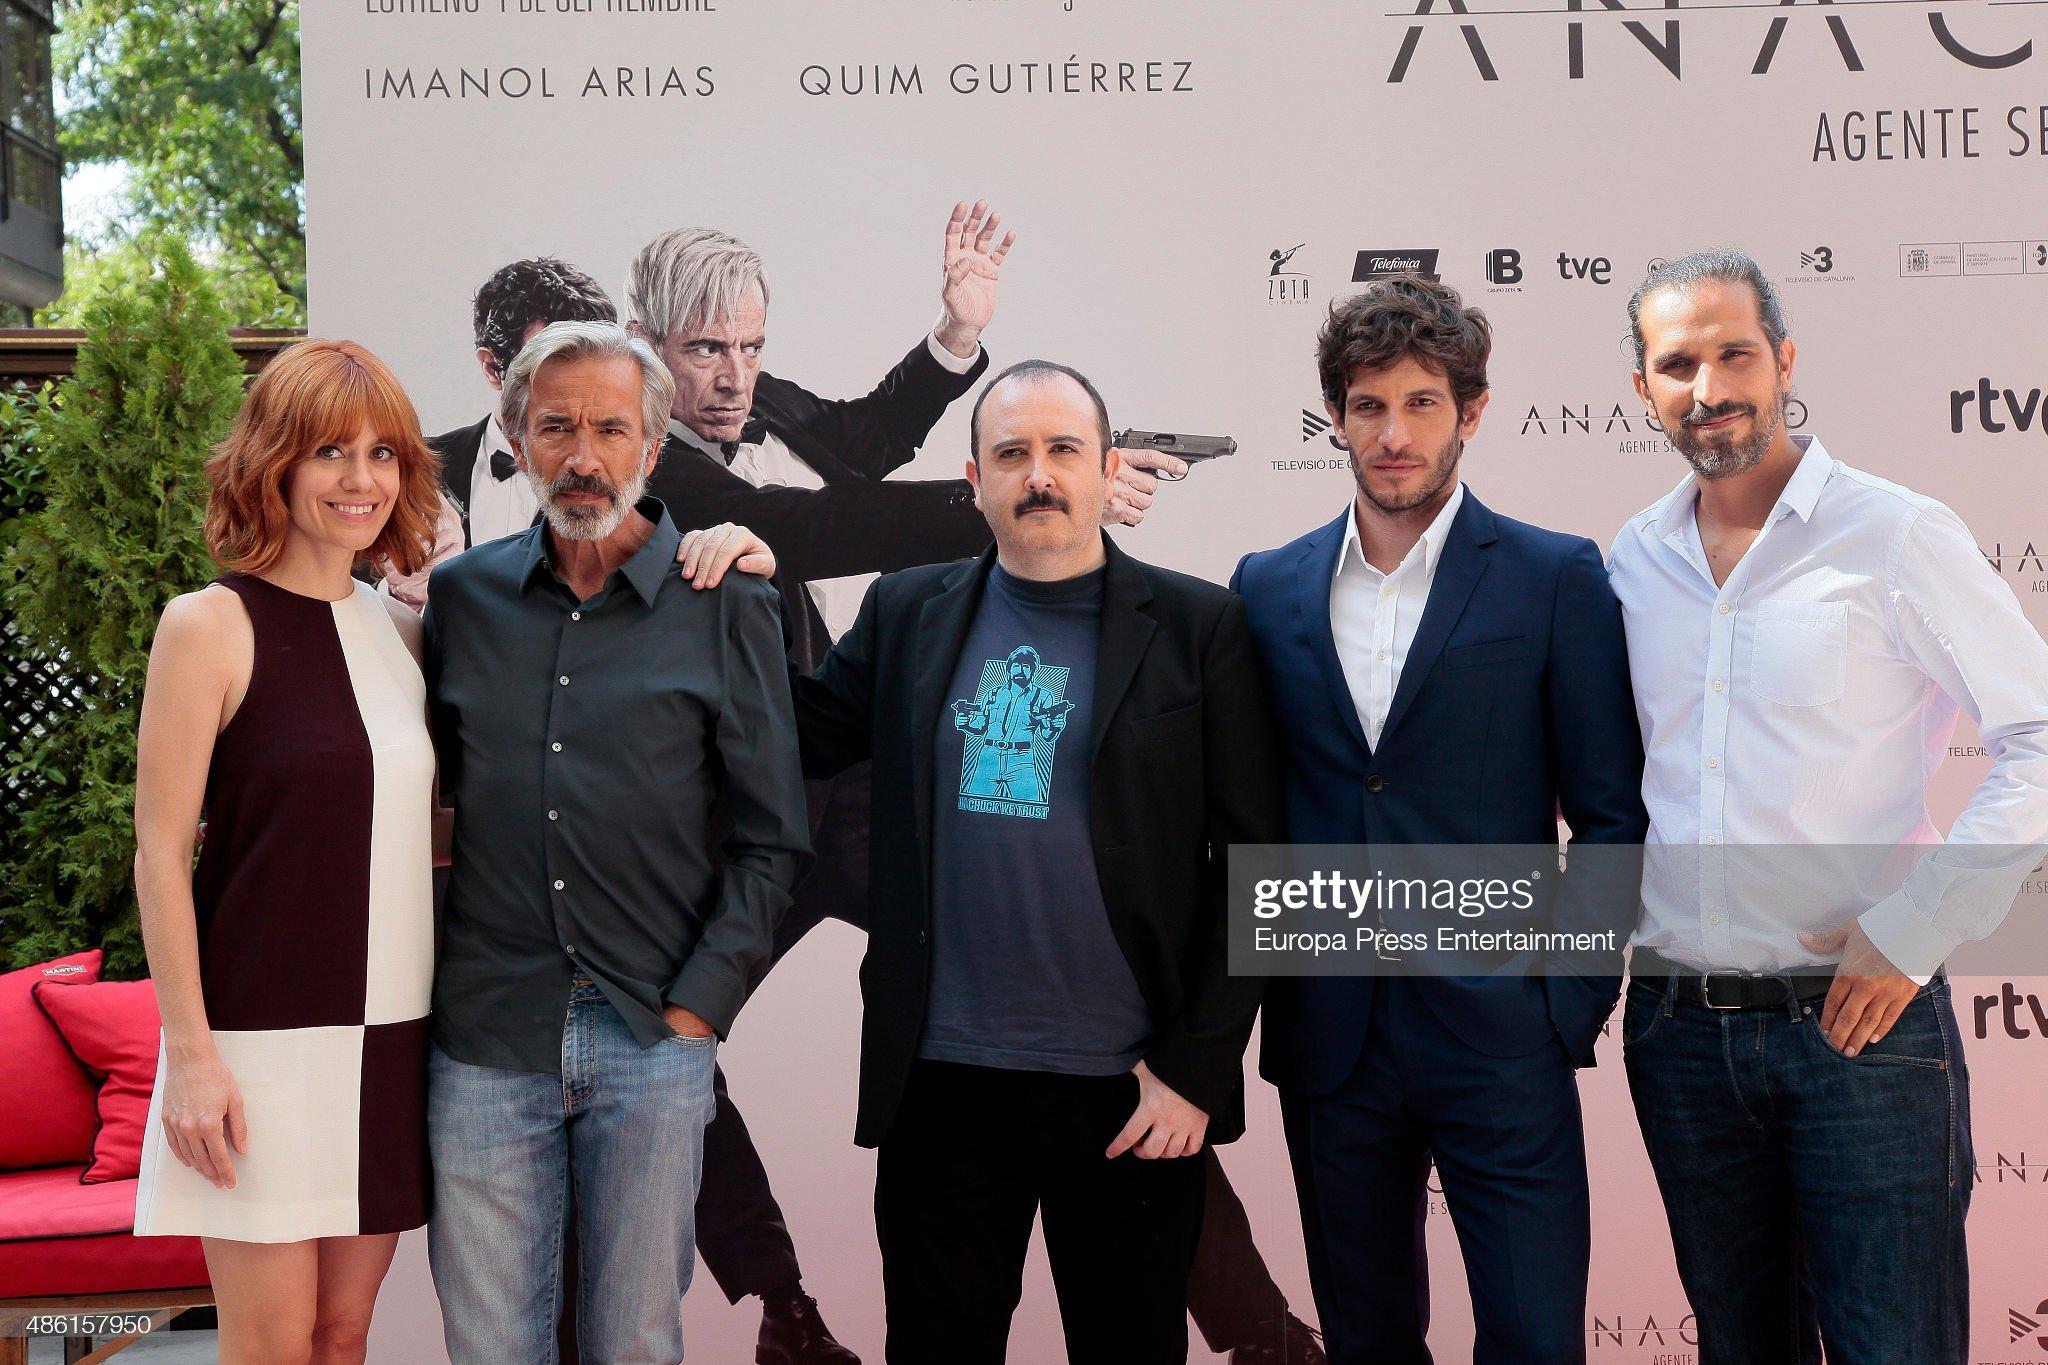 ¿Cuánto mide Julián López? - Altura - Página 3 Alexandra-jimenez-imanol-arias-carlos-areces-quim-gutierrez-and-ruiz-picture-id486157950?s=2048x2048